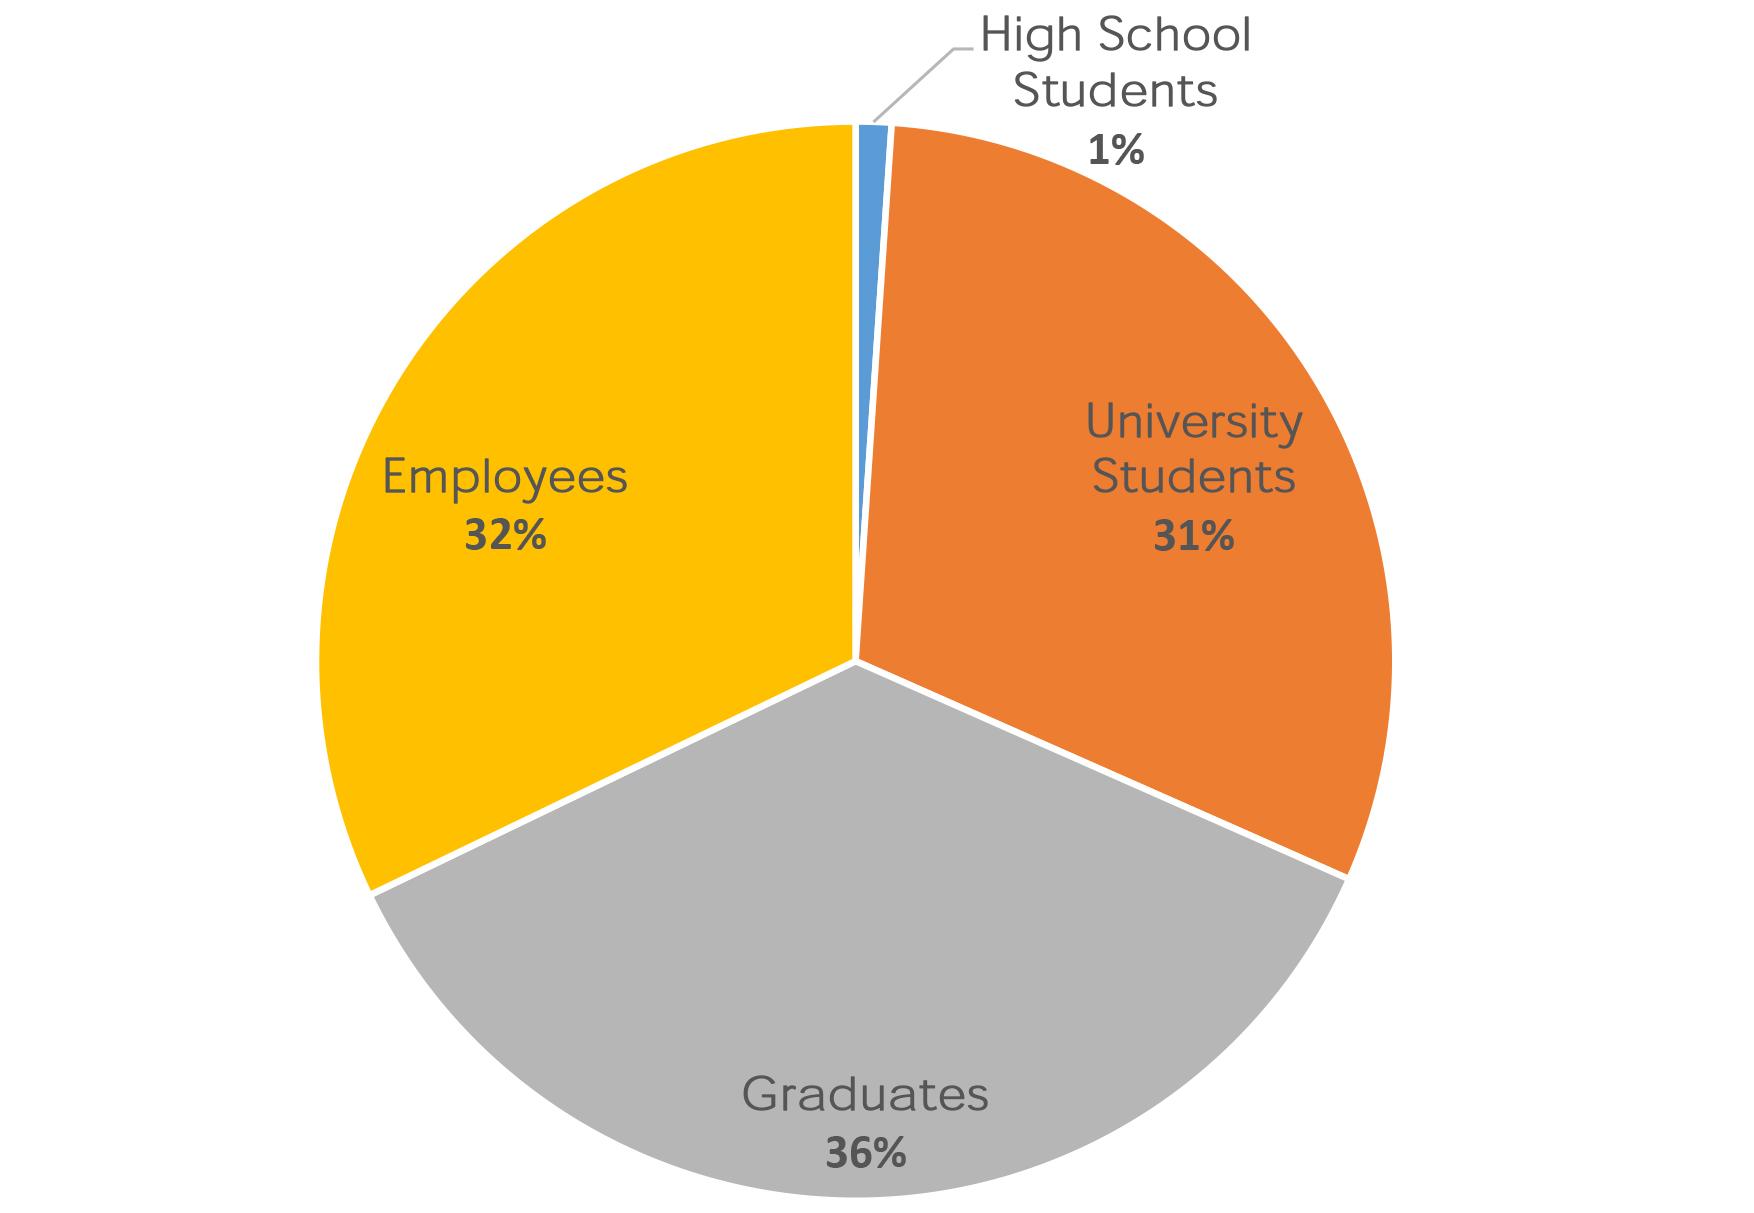 Students Data